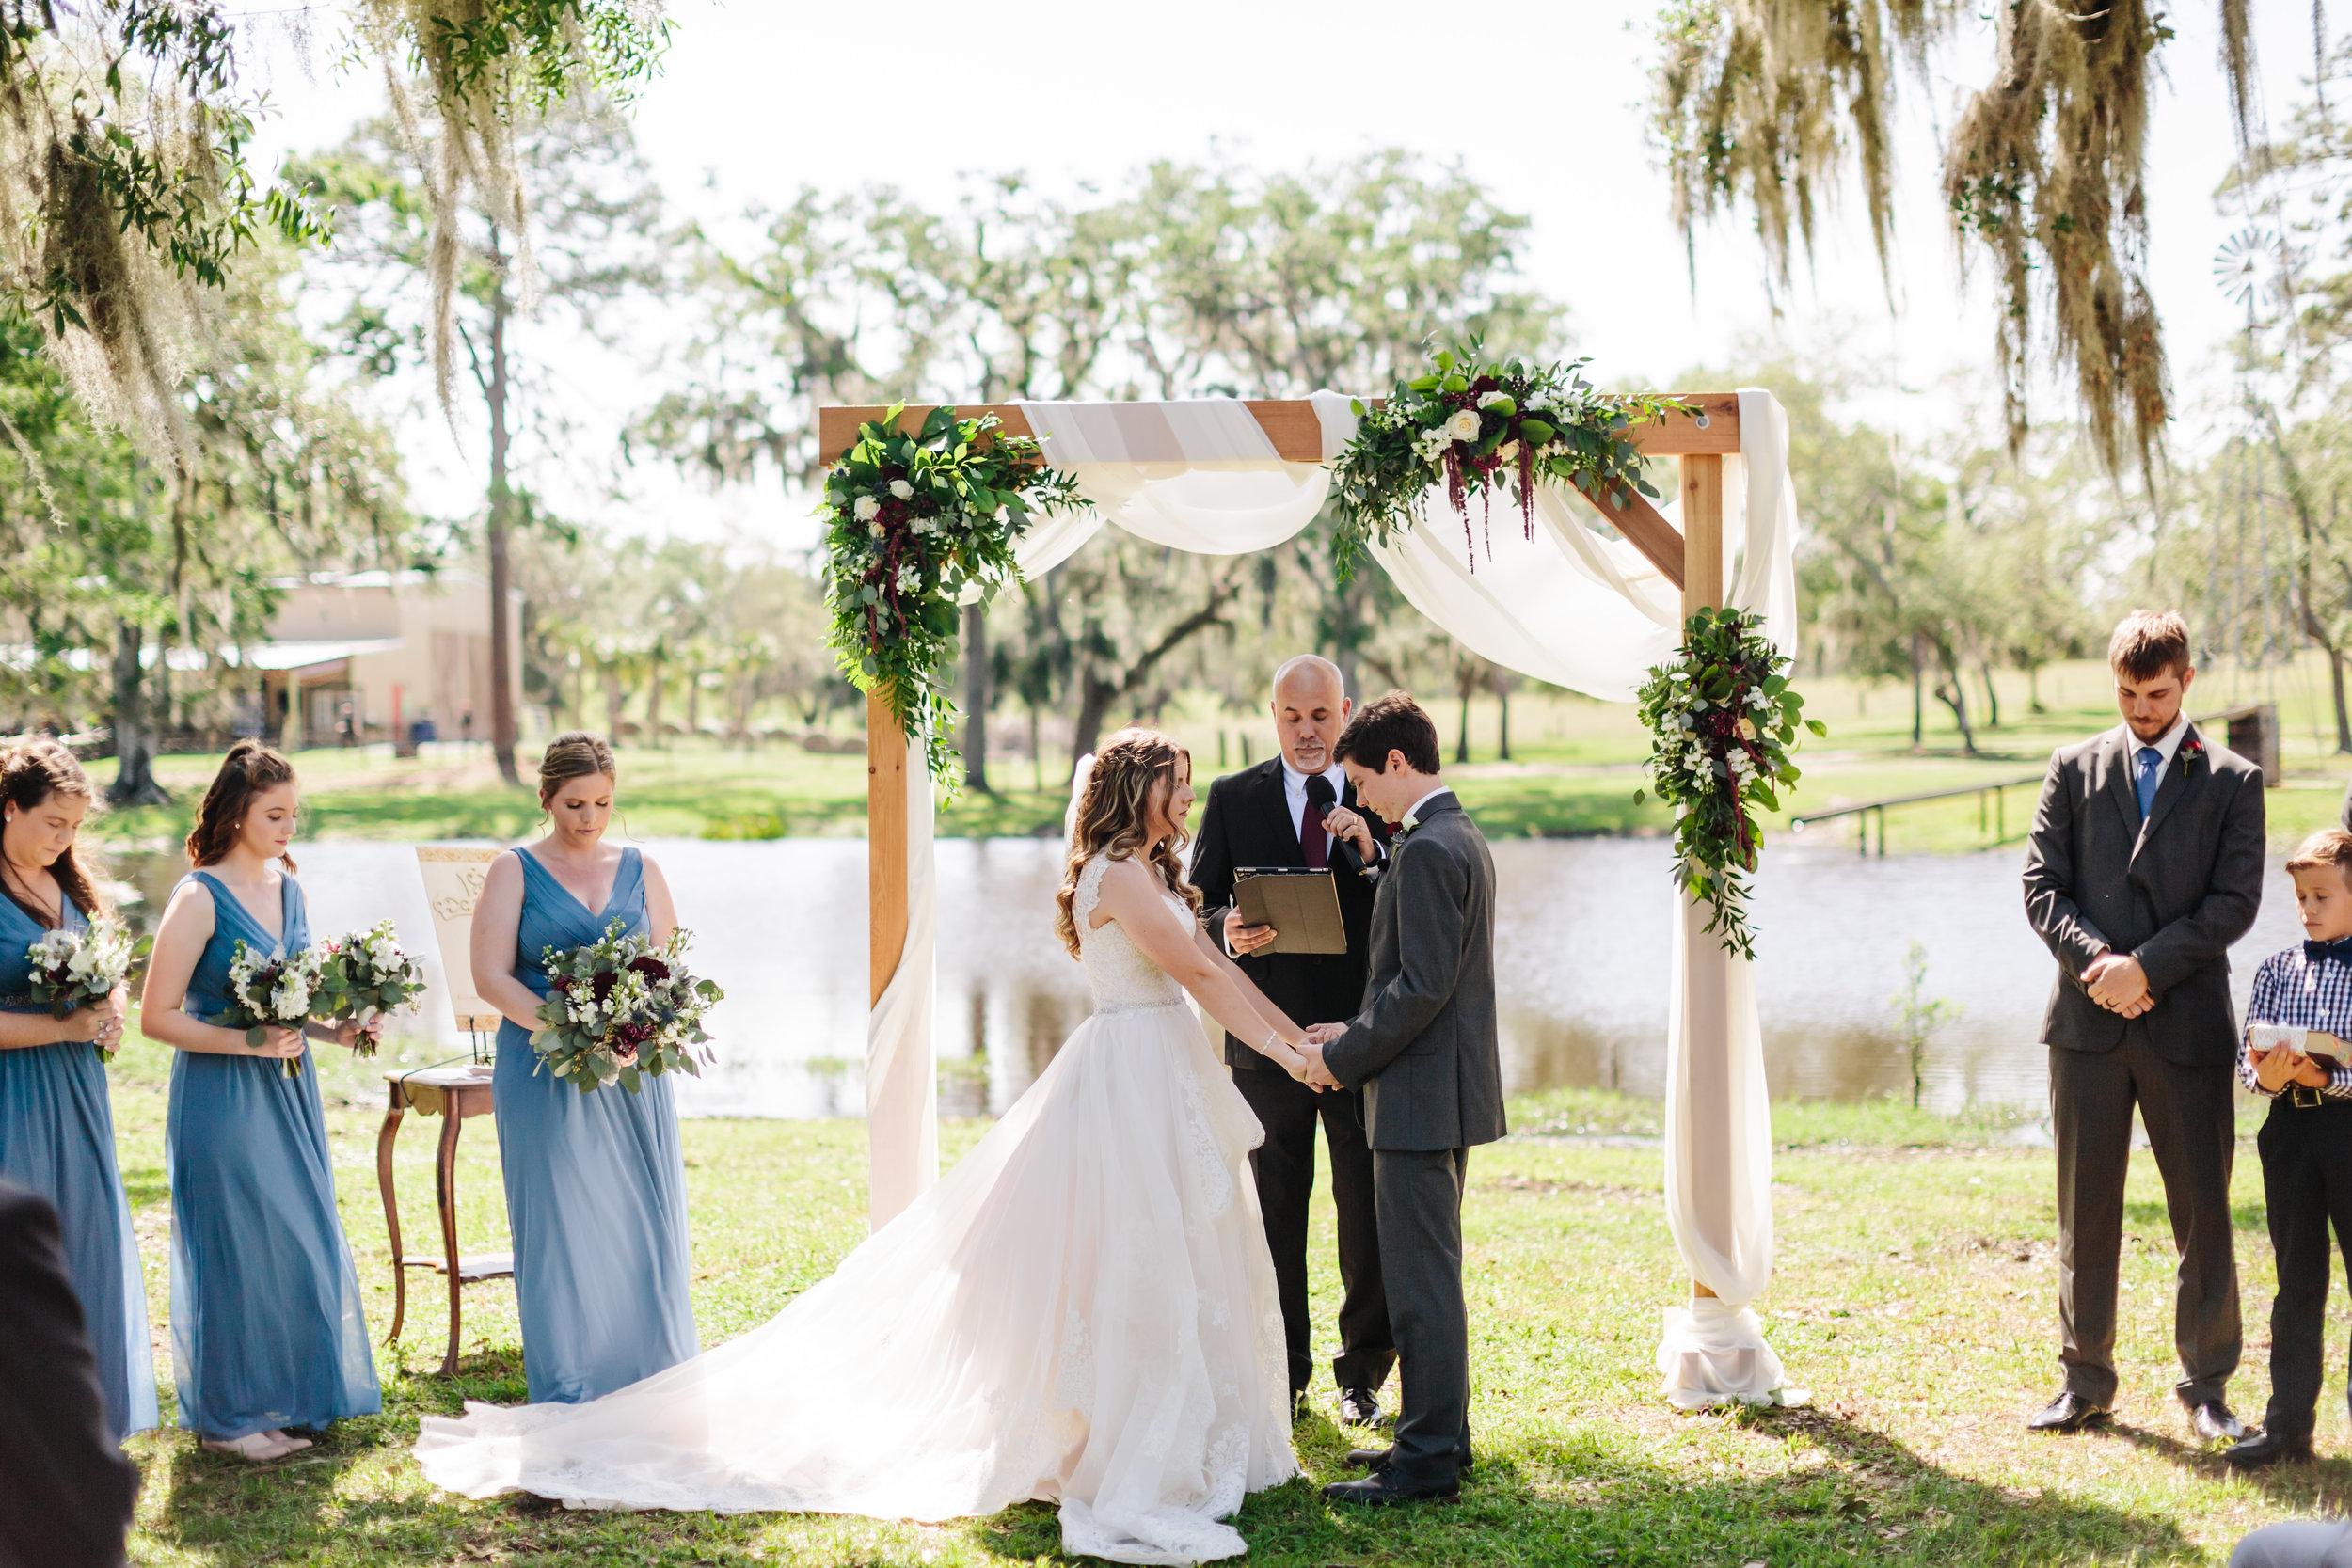 2018.04.14 Zak and Jamisyn Unrue Black Willow Barn Wedding Finals-343.jpg